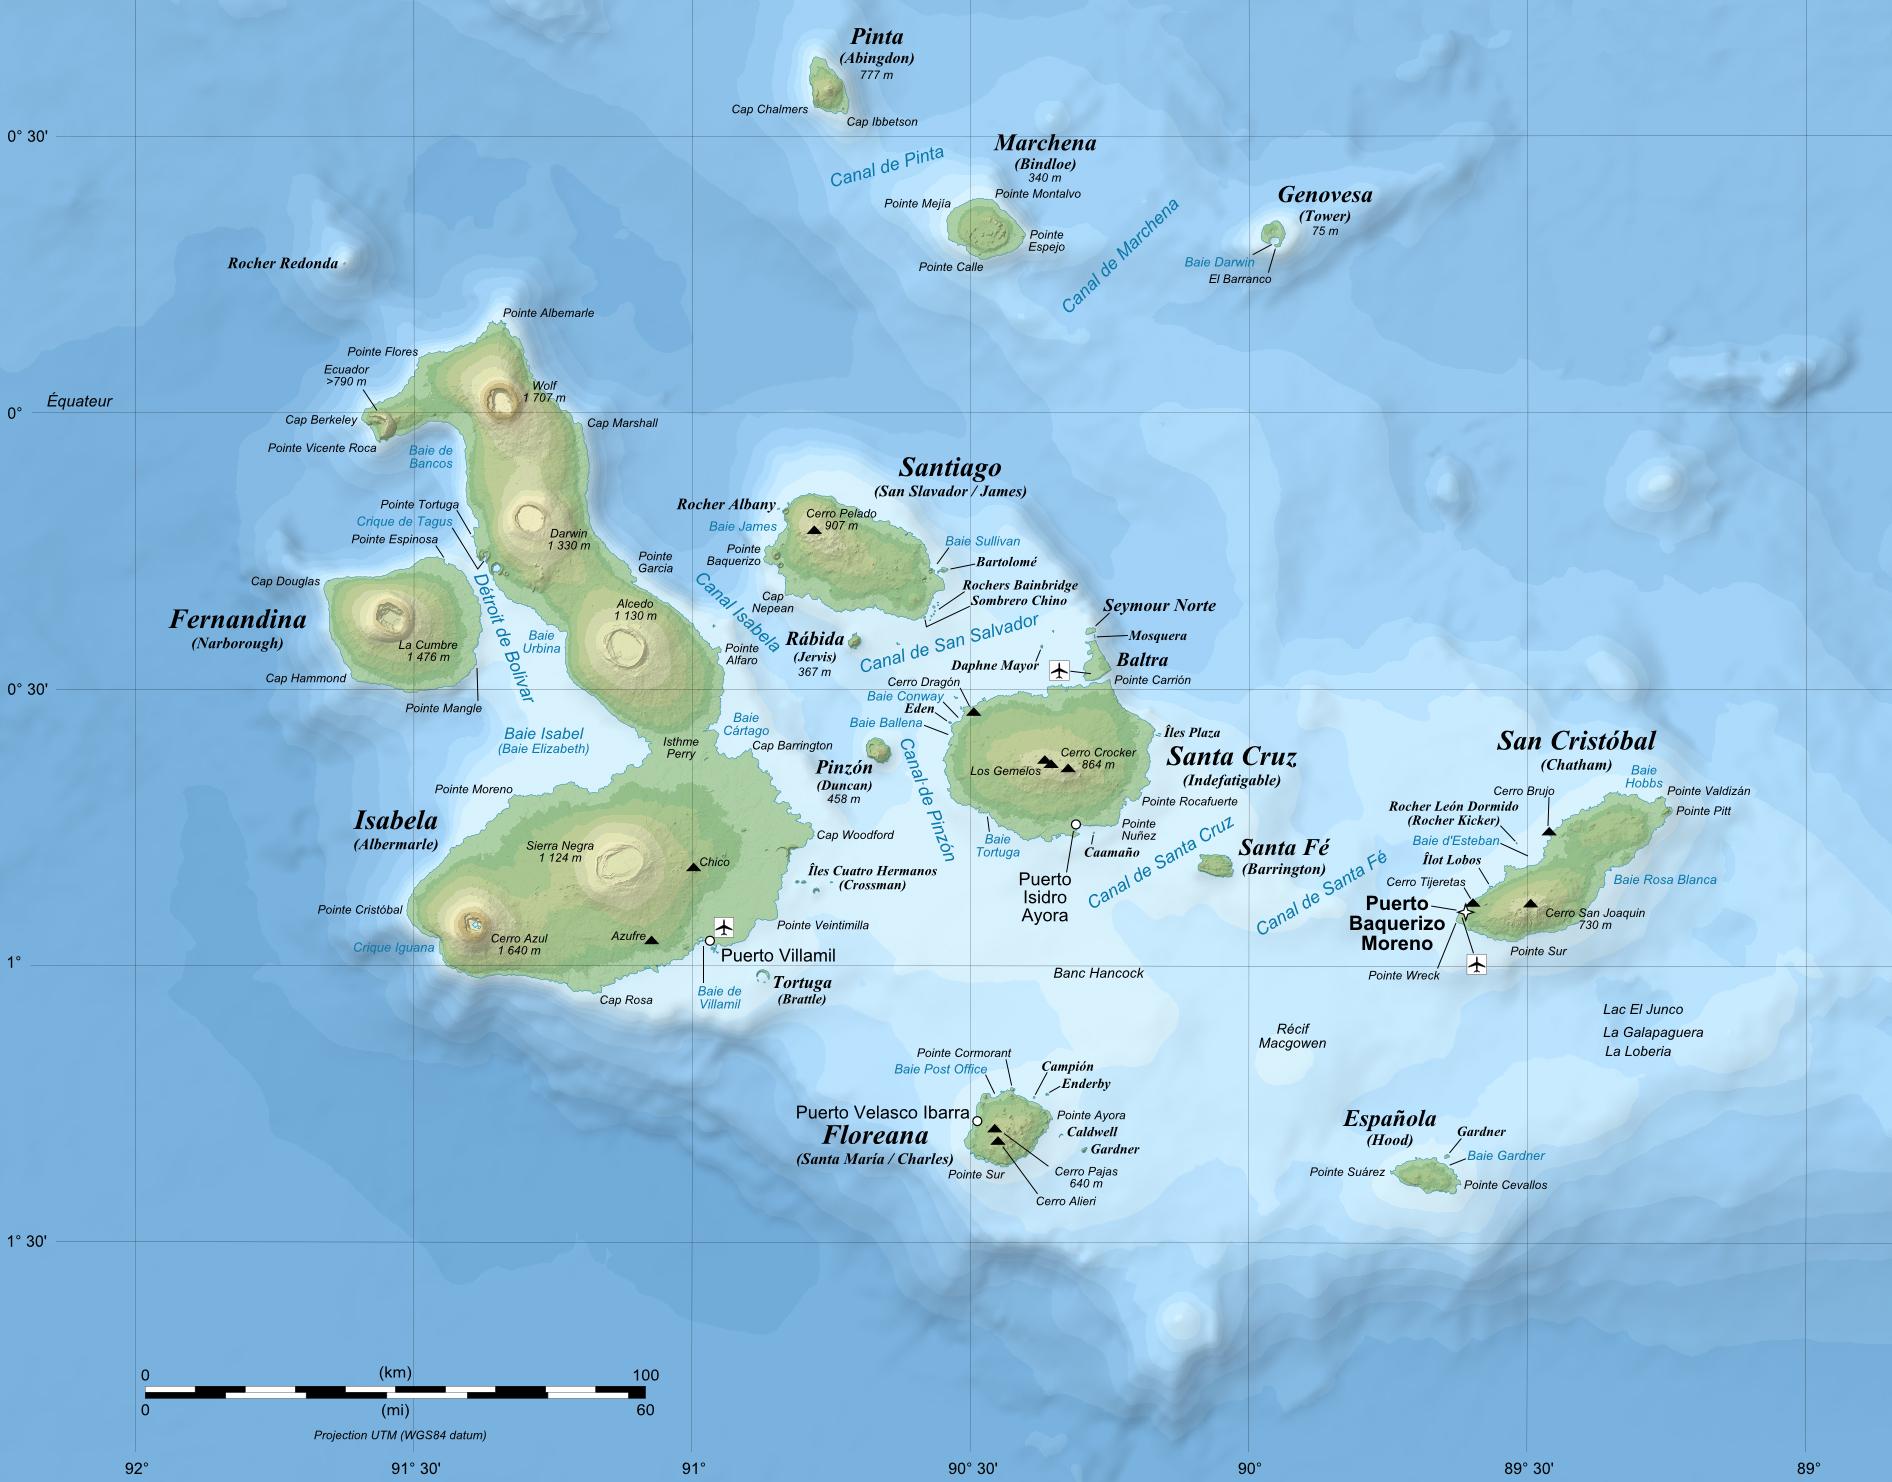 Image Galapagos Mapjpg Wanderlust Wiki FANDOM Powered By Wikia - Galapagos map